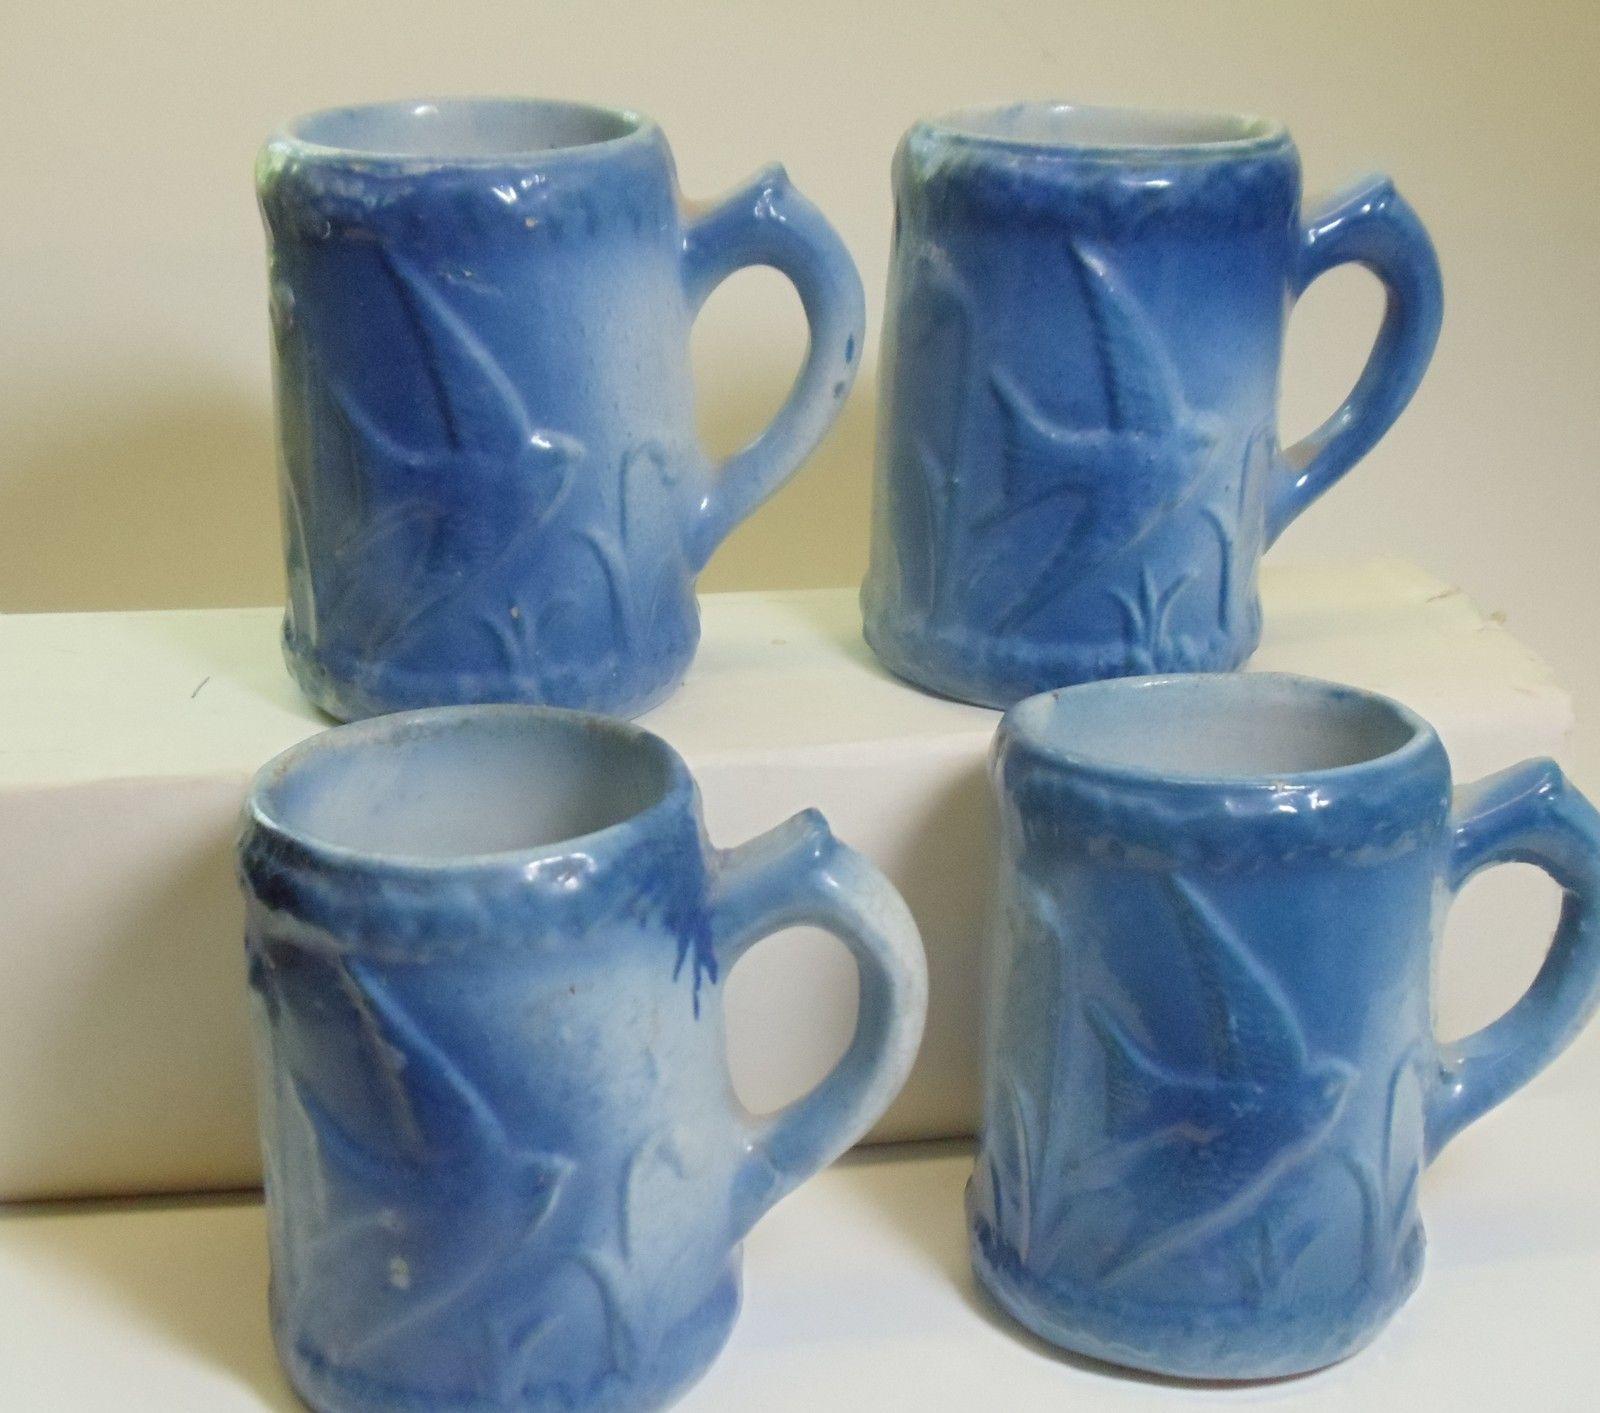 Rocca Mug (15 Oz., Matte Black) | Custom Ceramic Mugs | 3 ...  |Black Stoneware Pottery Mug